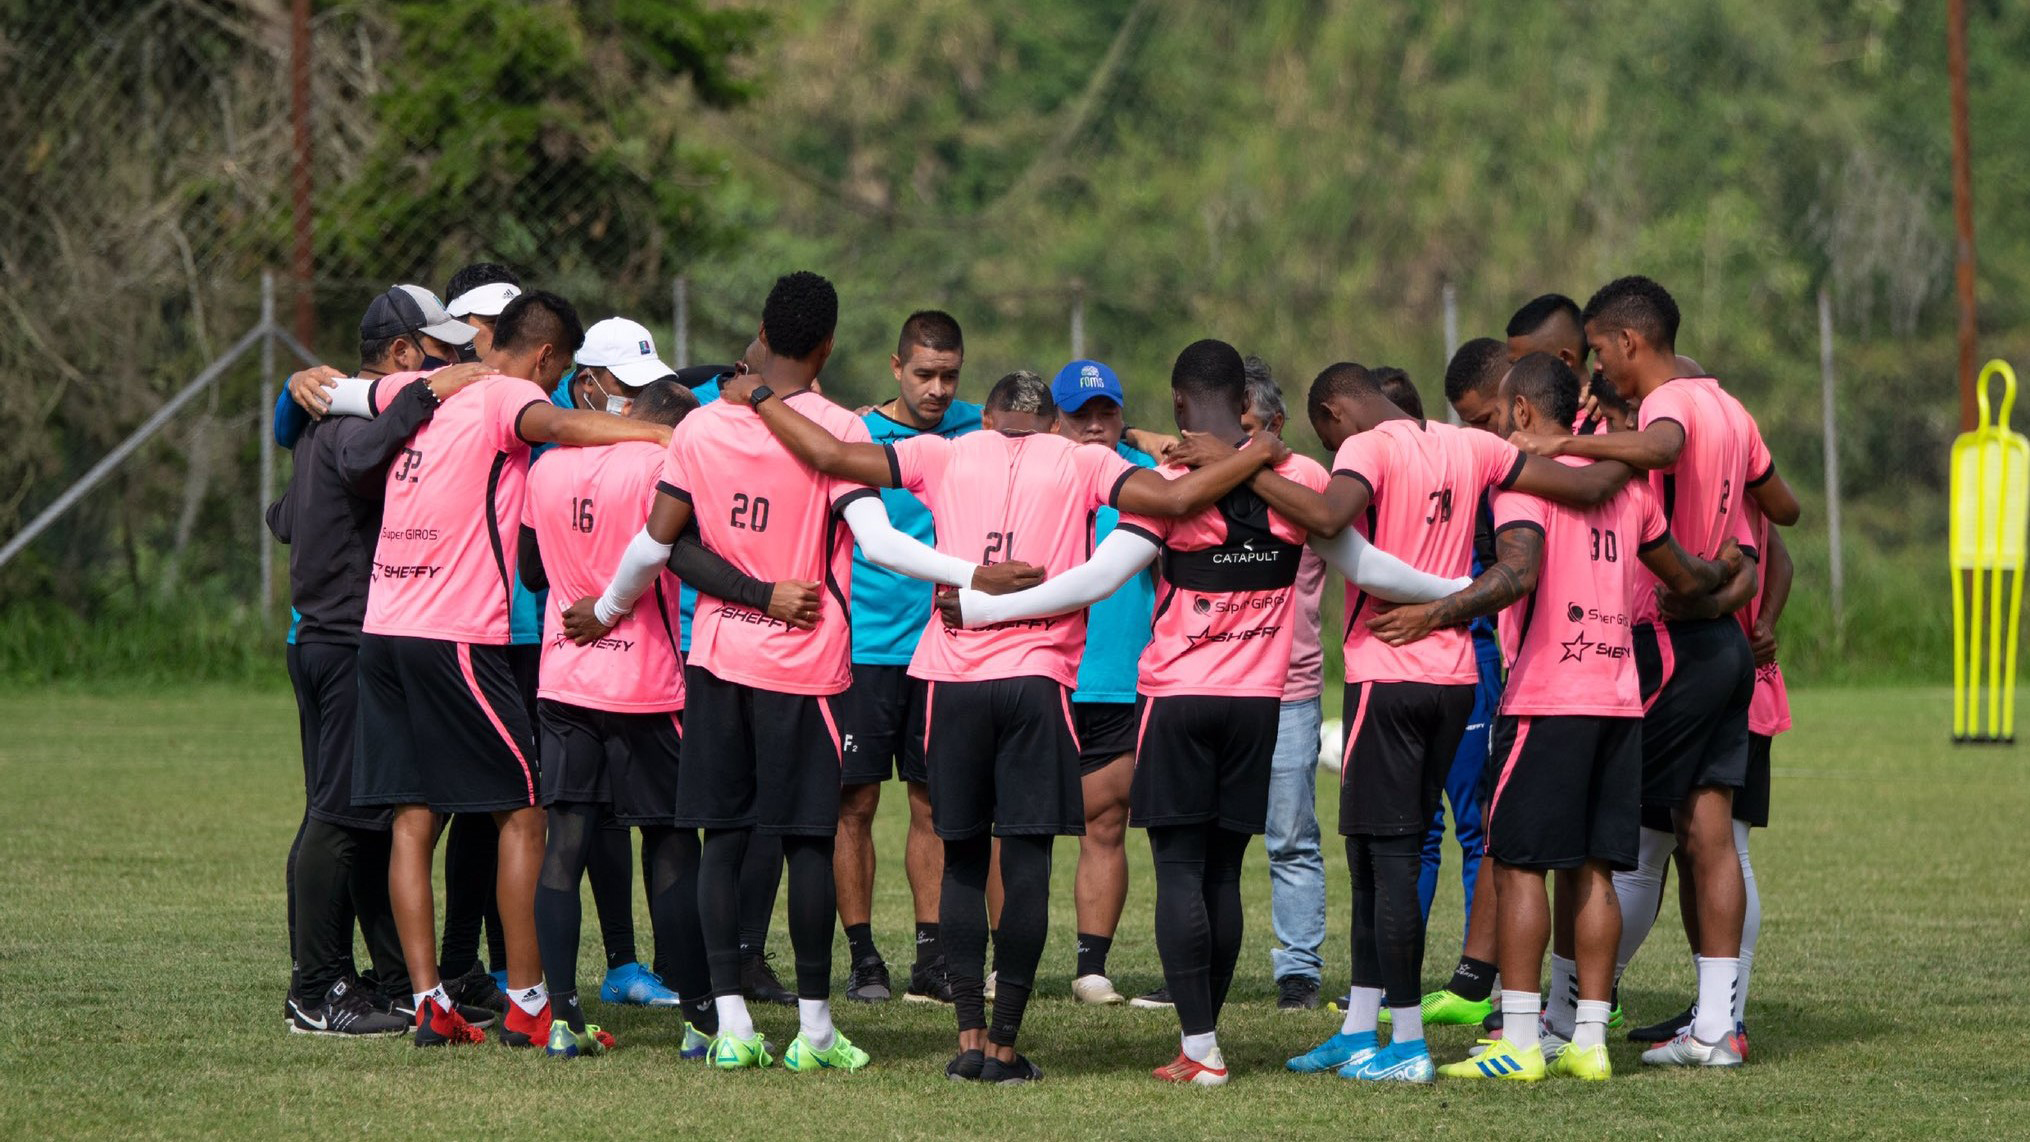 champions-league-juan-guillermo-cuadrado-james-rodriguez-david-ospina-casa-blanca-oc